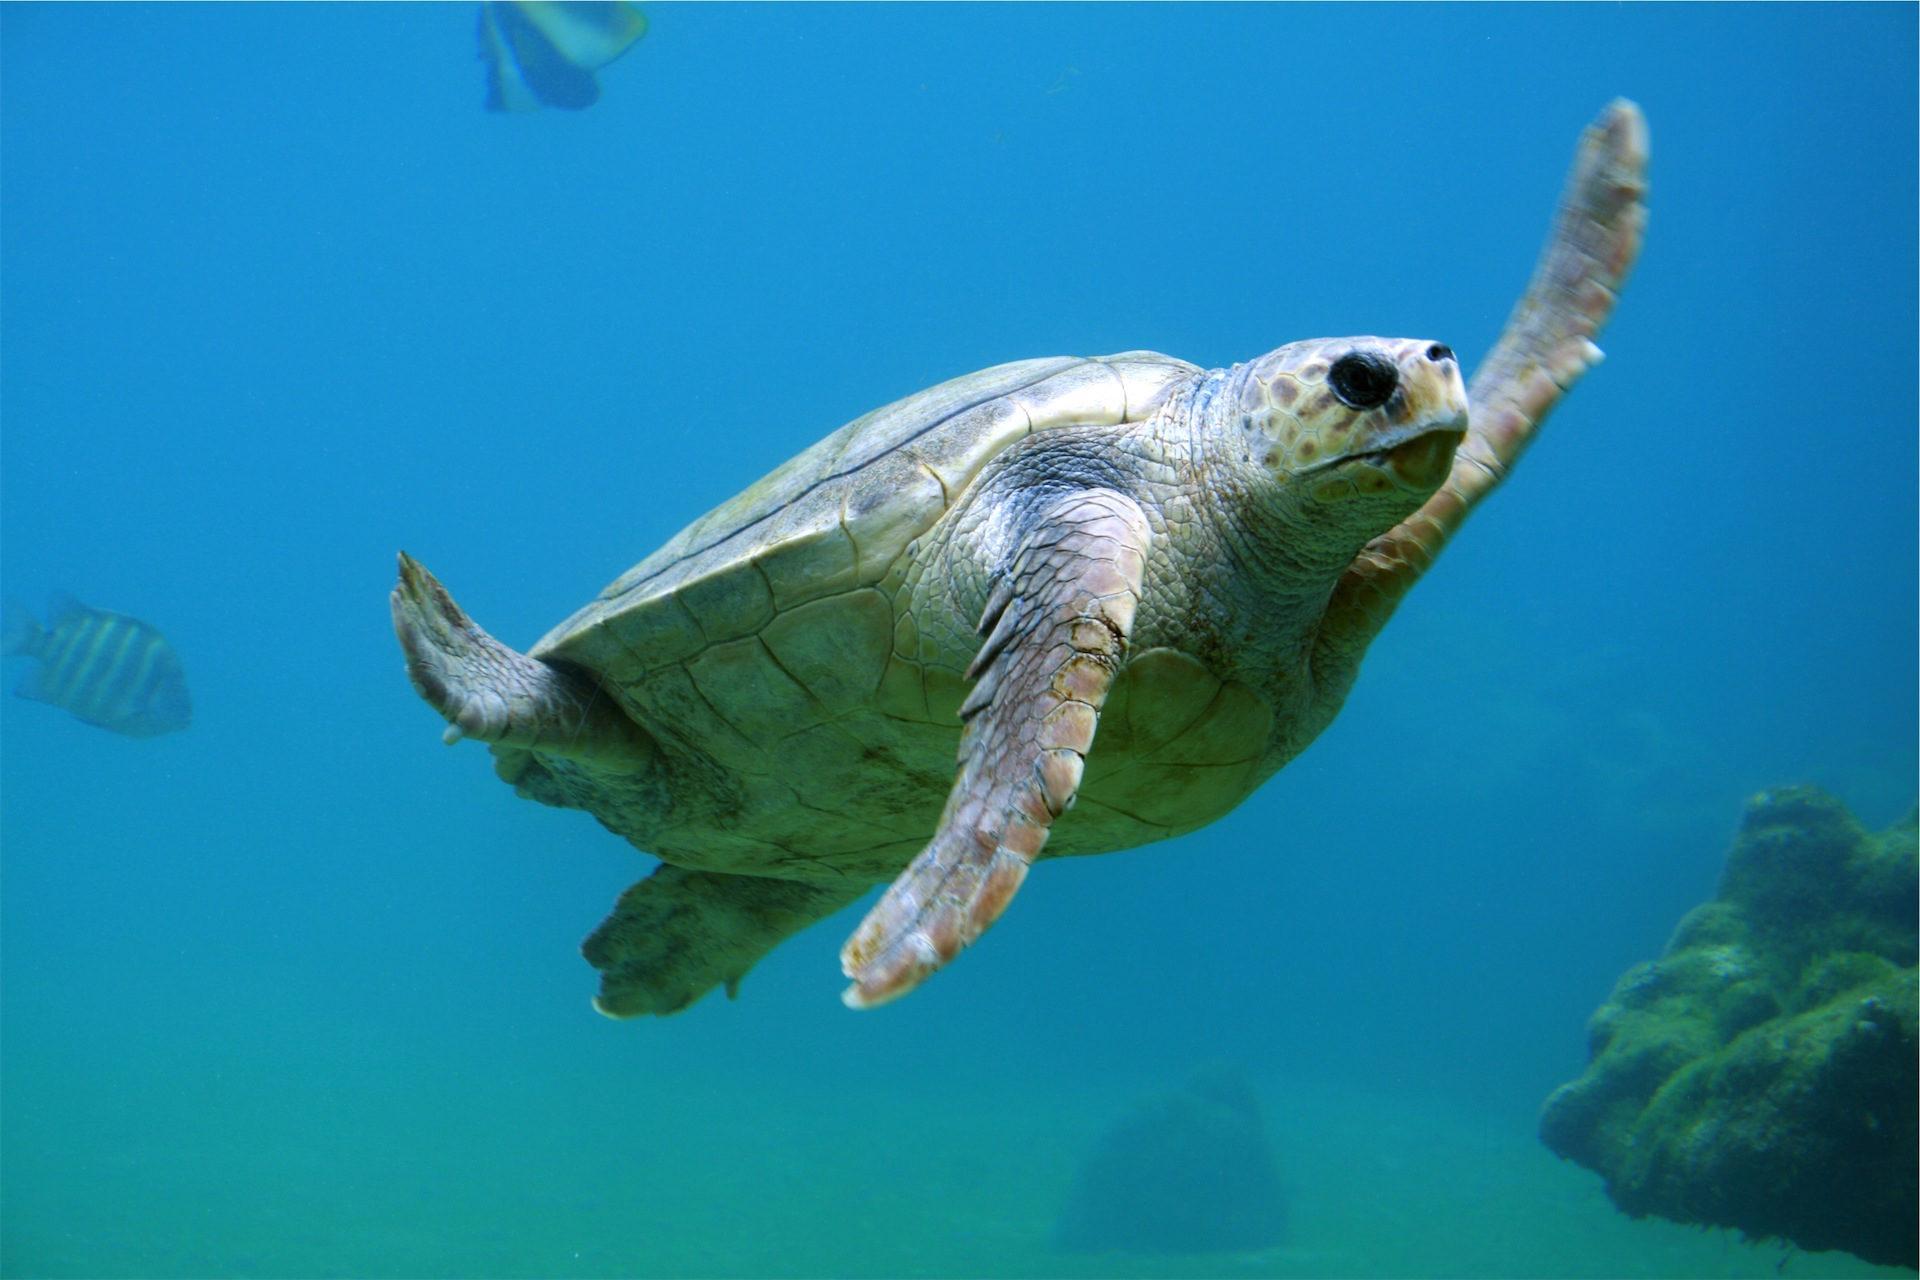 Schildkröte, Unterwasser, Meer, Ozean, Marino - Wallpaper HD - Prof.-falken.com